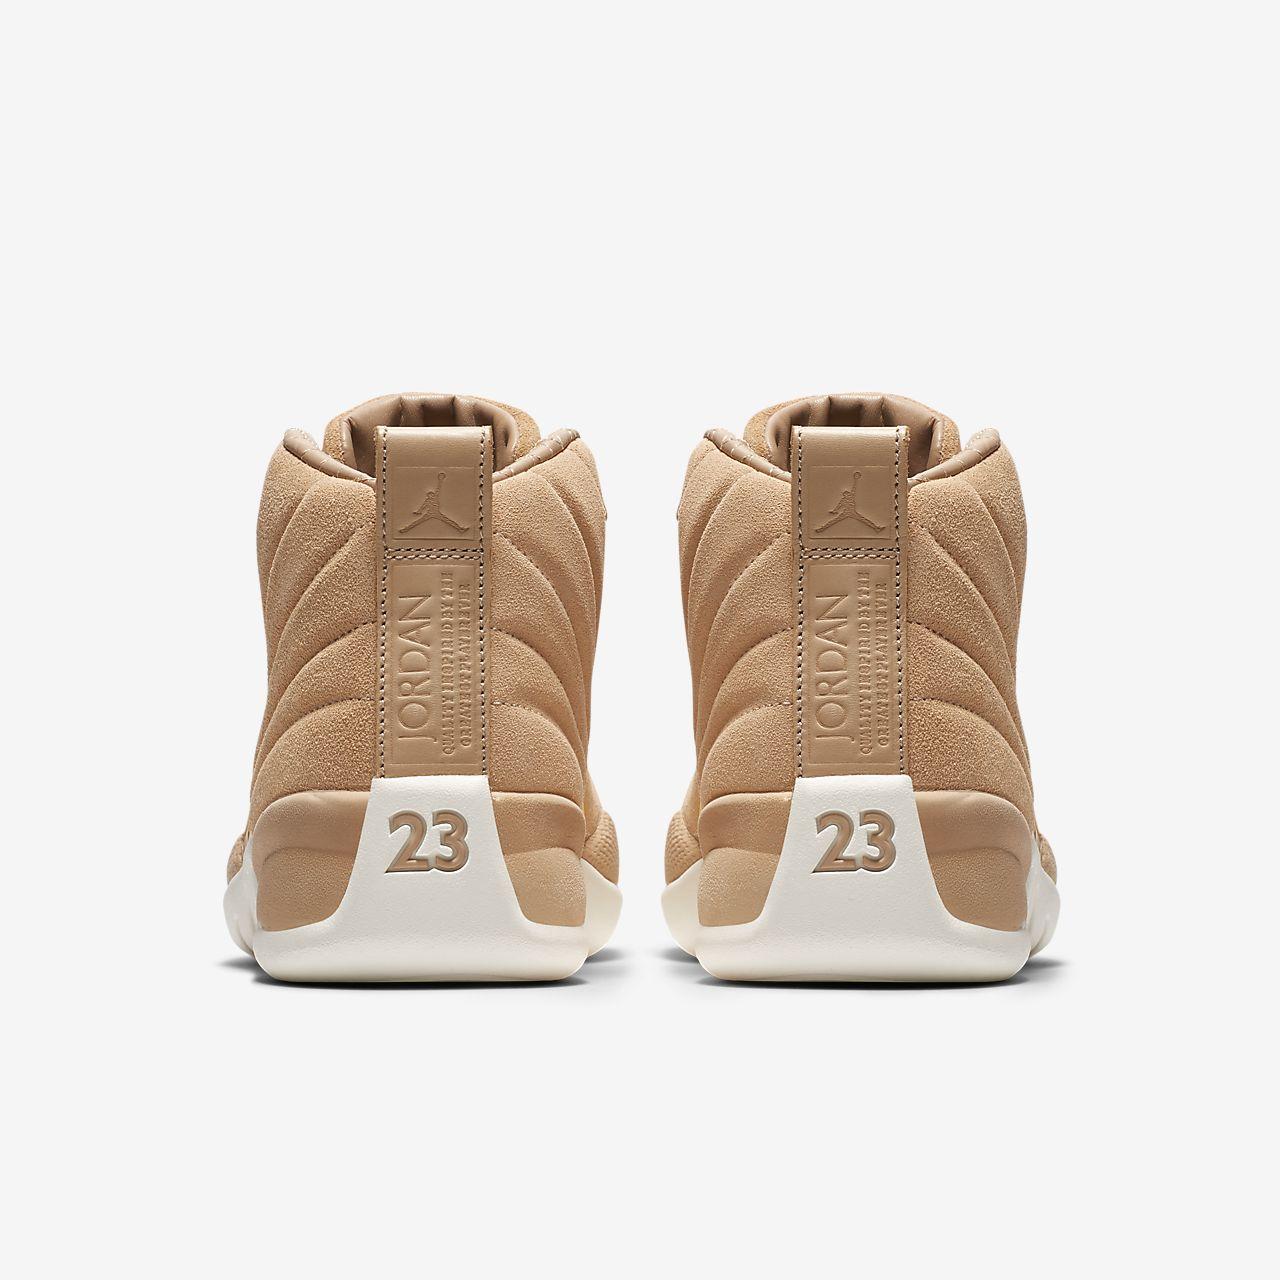 Air Jordan Retro 11 Womens Shoe Beige Pink shoes